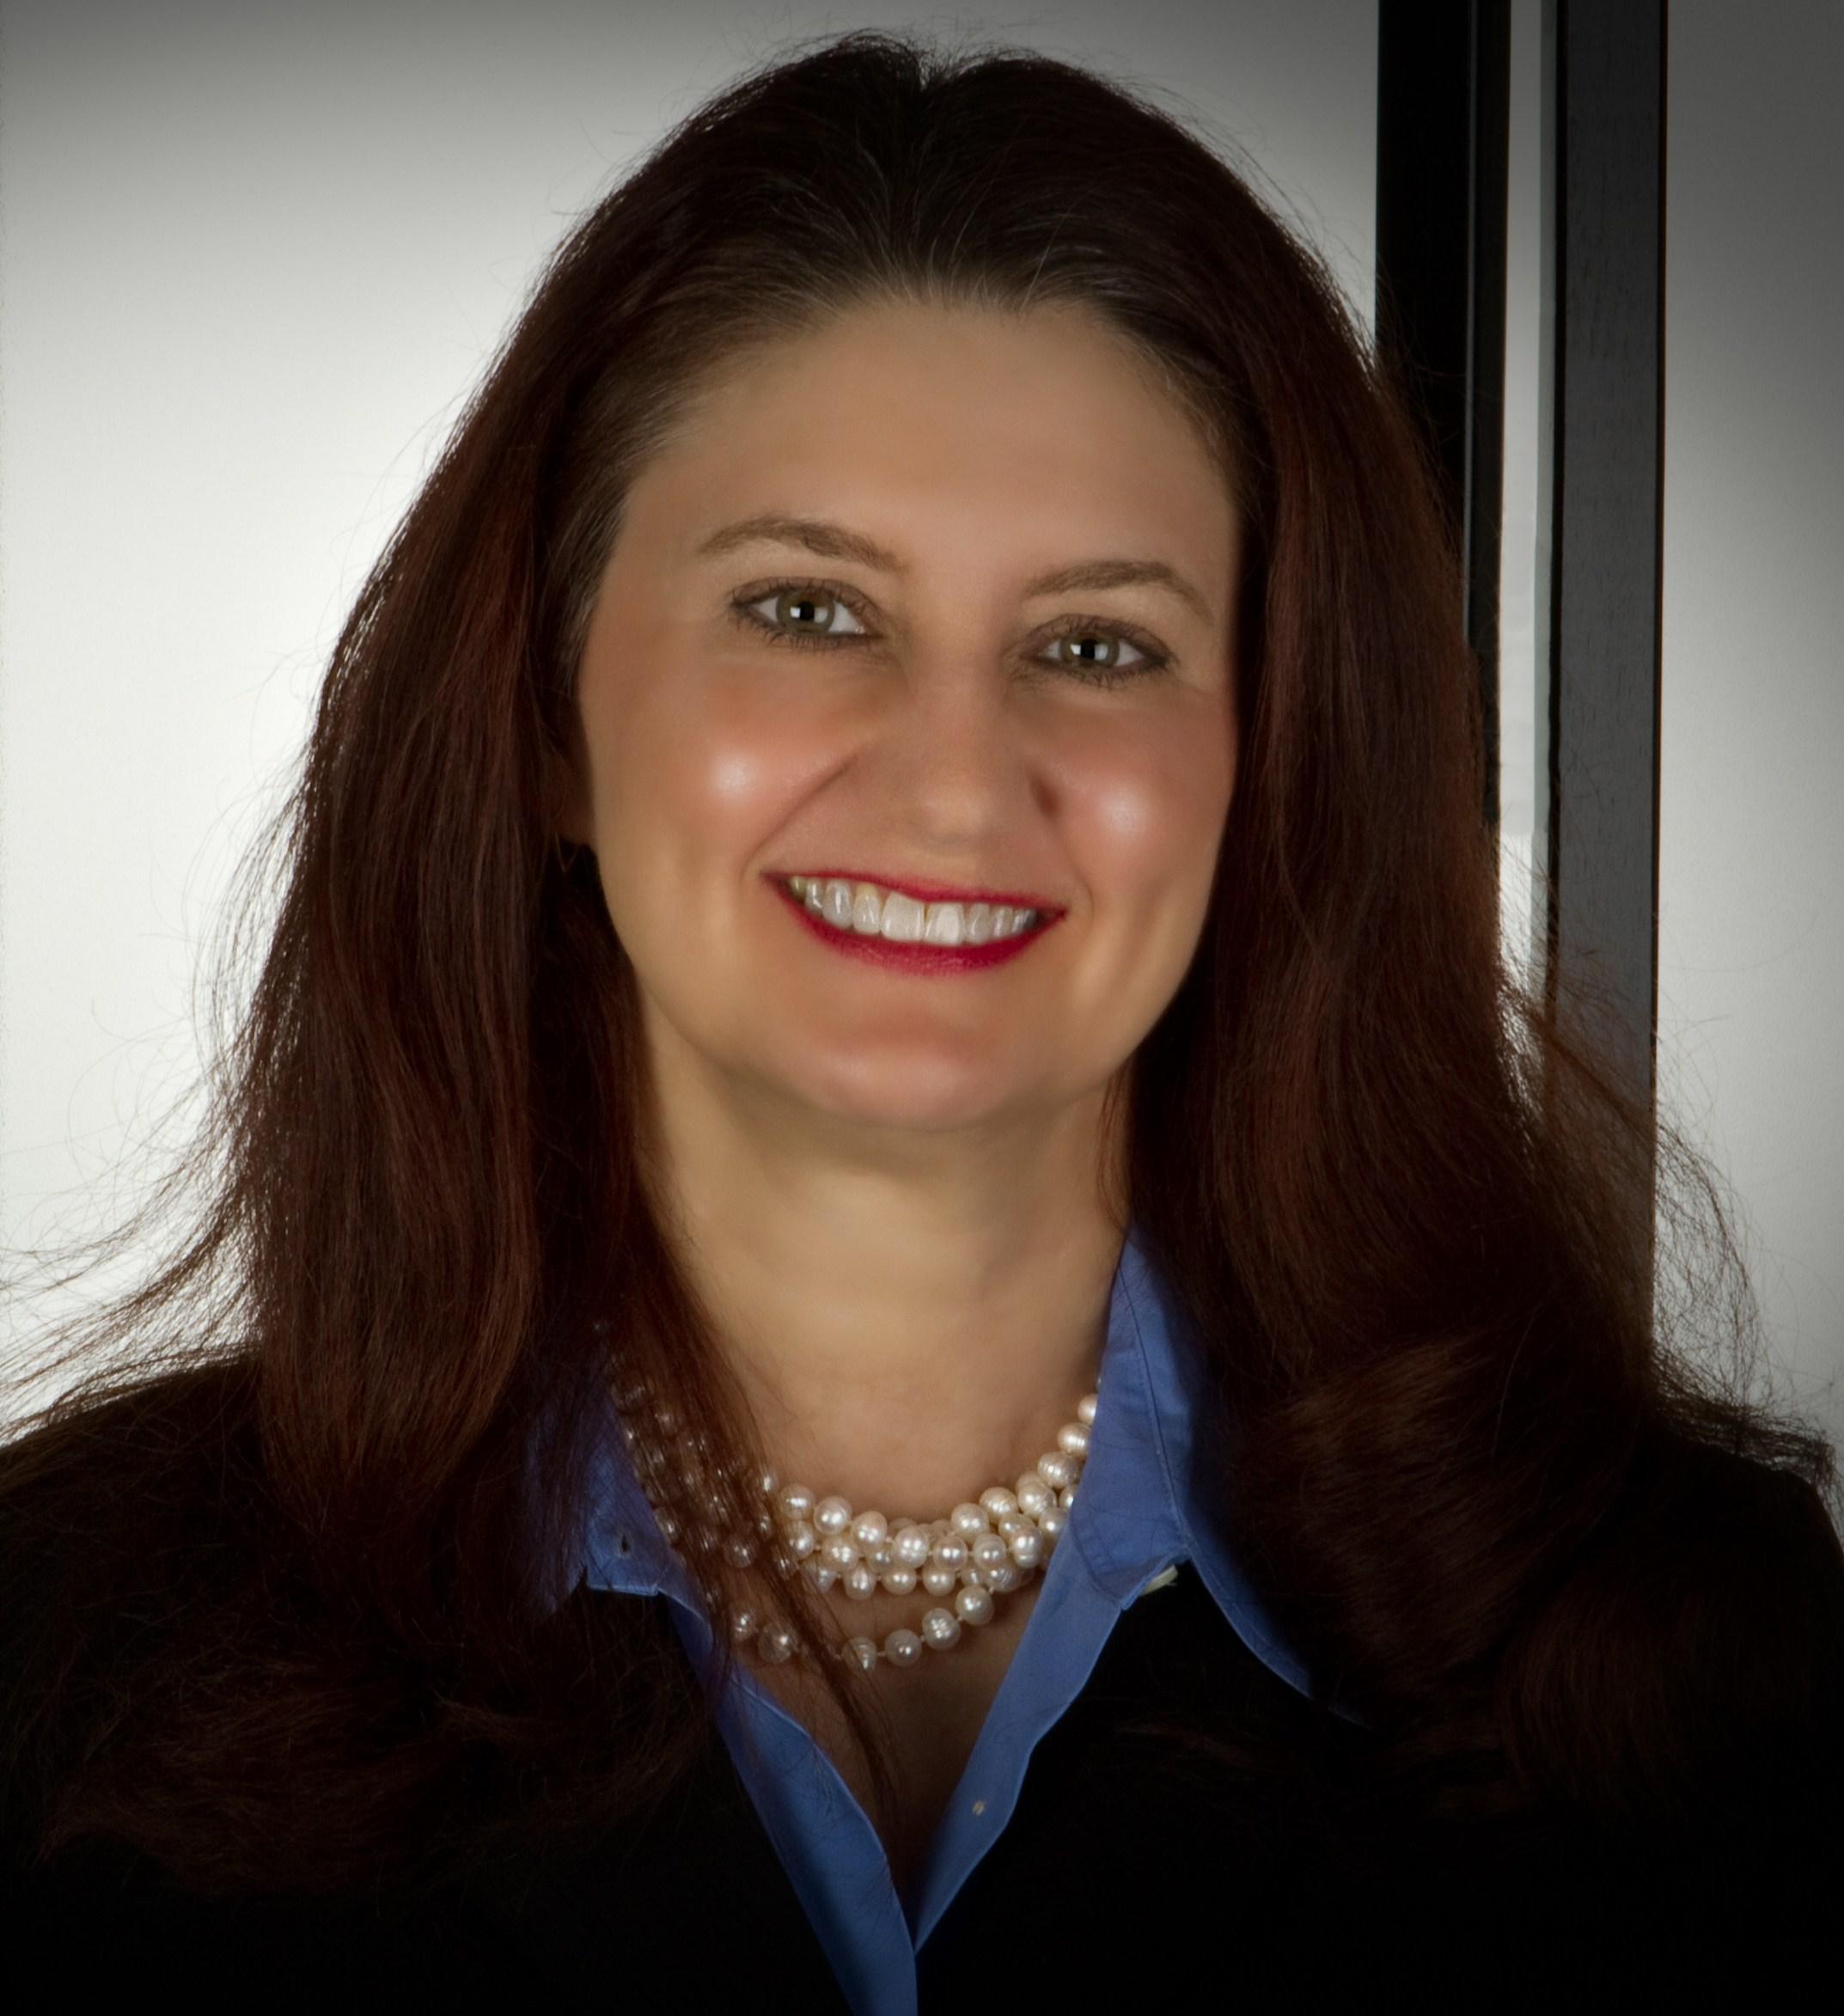 Connie J. Mableson, PLLC